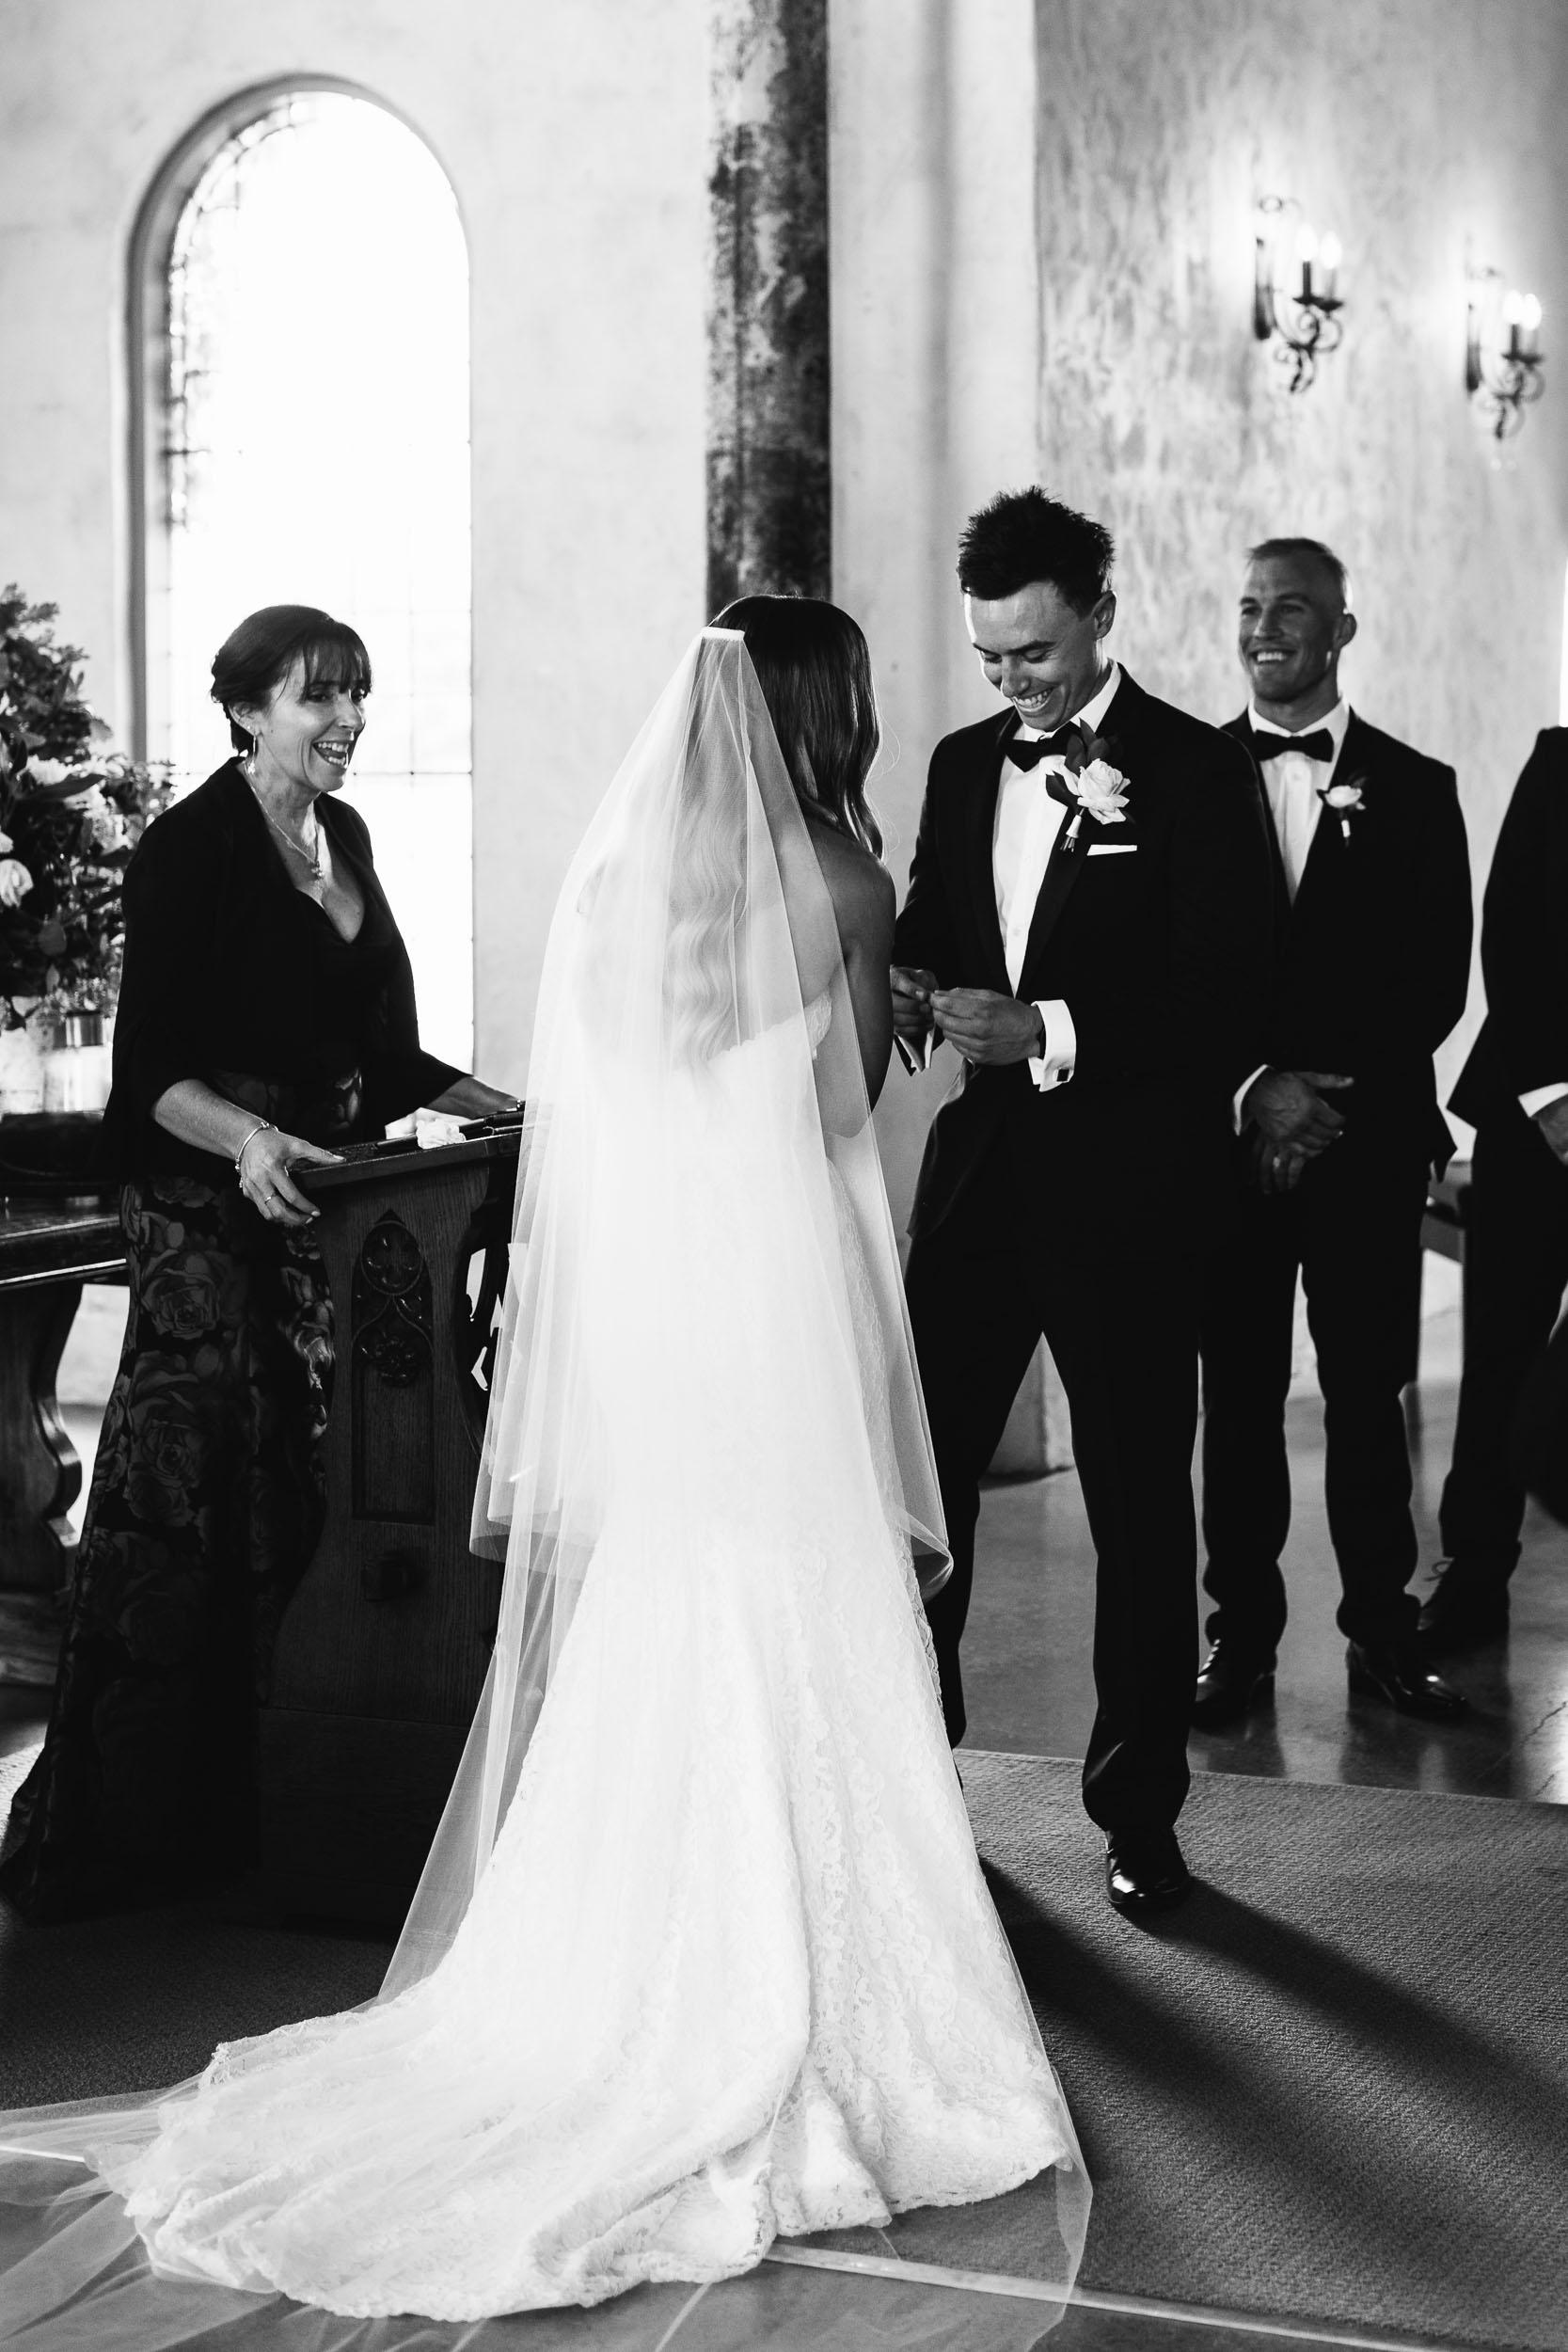 Kas-Richards-Stones-of-the-Yarra-Valley-Wedding-376.jpg